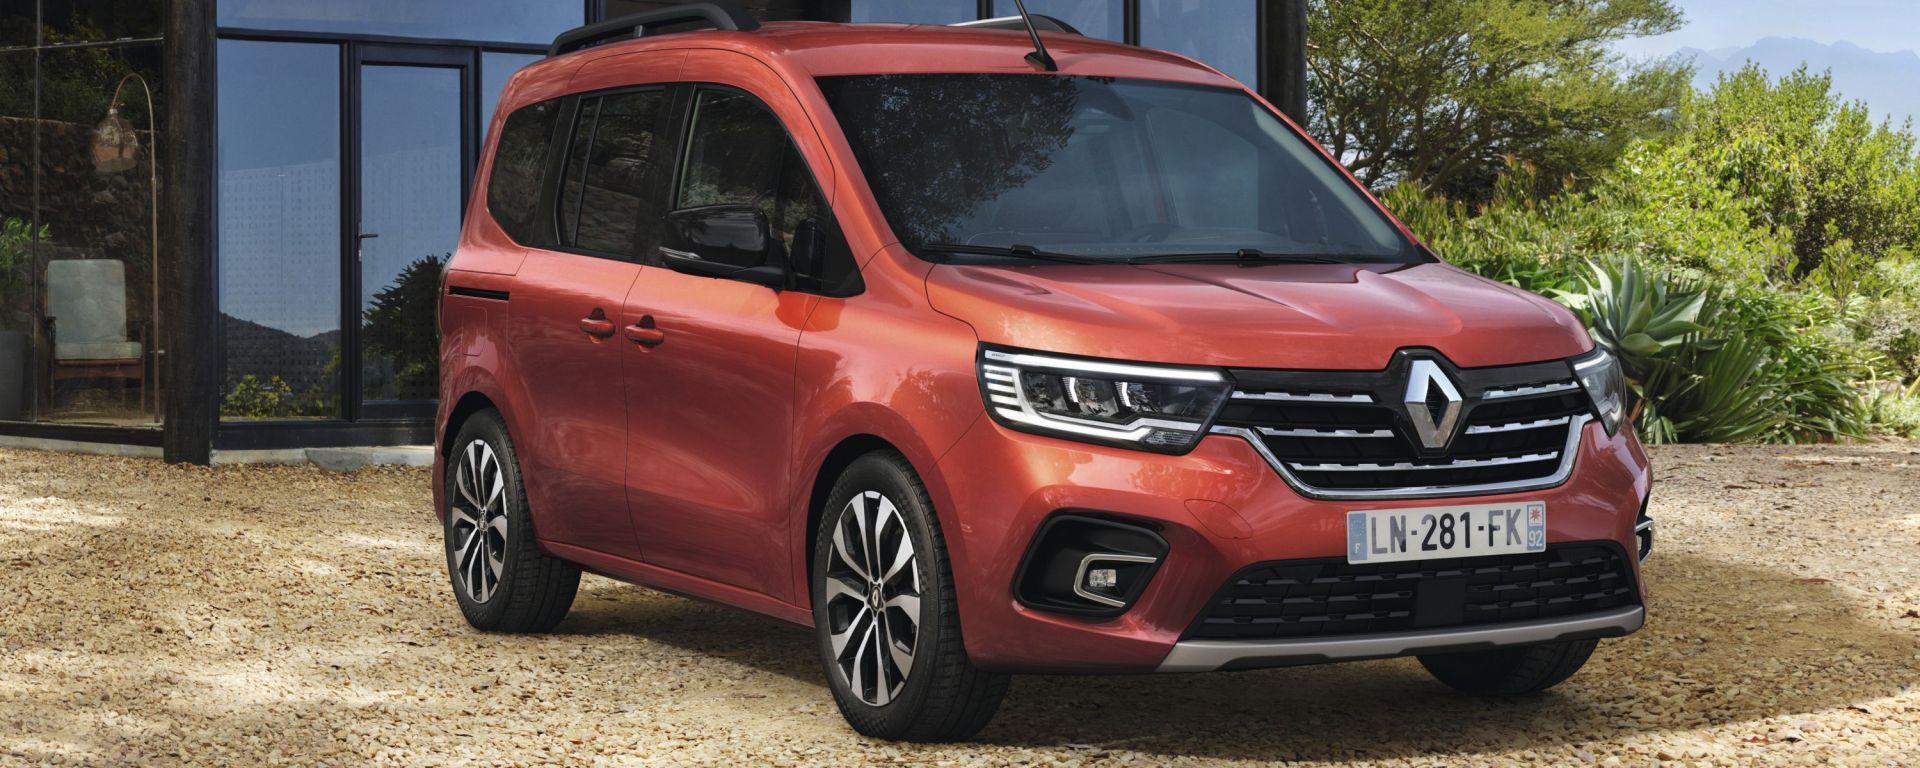 Nuova Renault Kangoo 2021: visuale di 3/4 anteriore